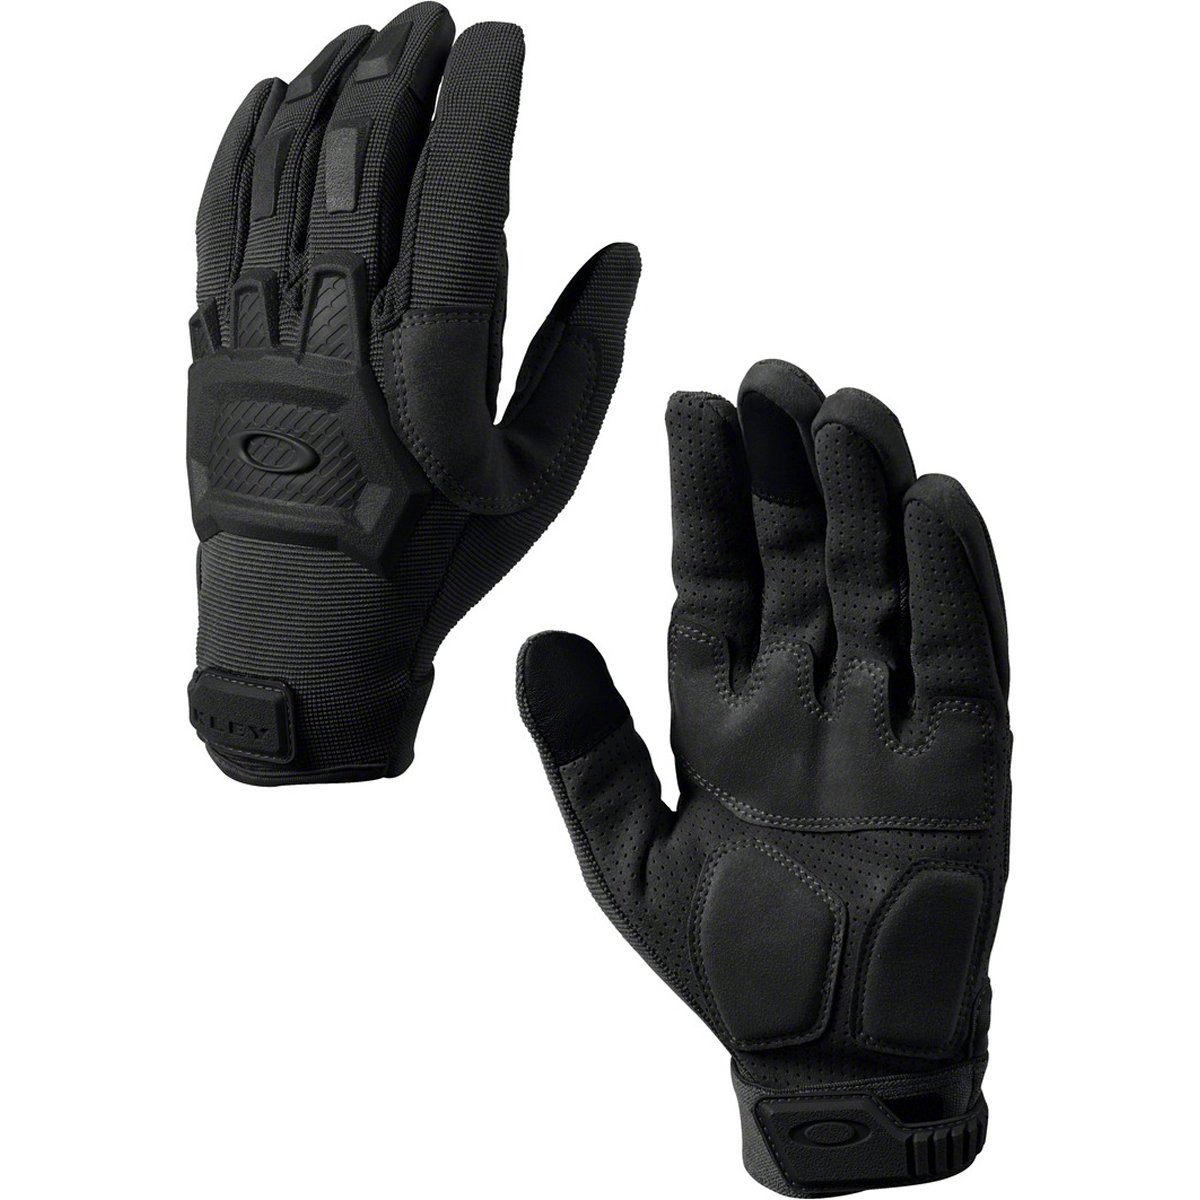 5b320a1f578 Amazon.com  Oakley Flexion Mens Snow Snowmobile Gloves - Black  Sports    Outdoors